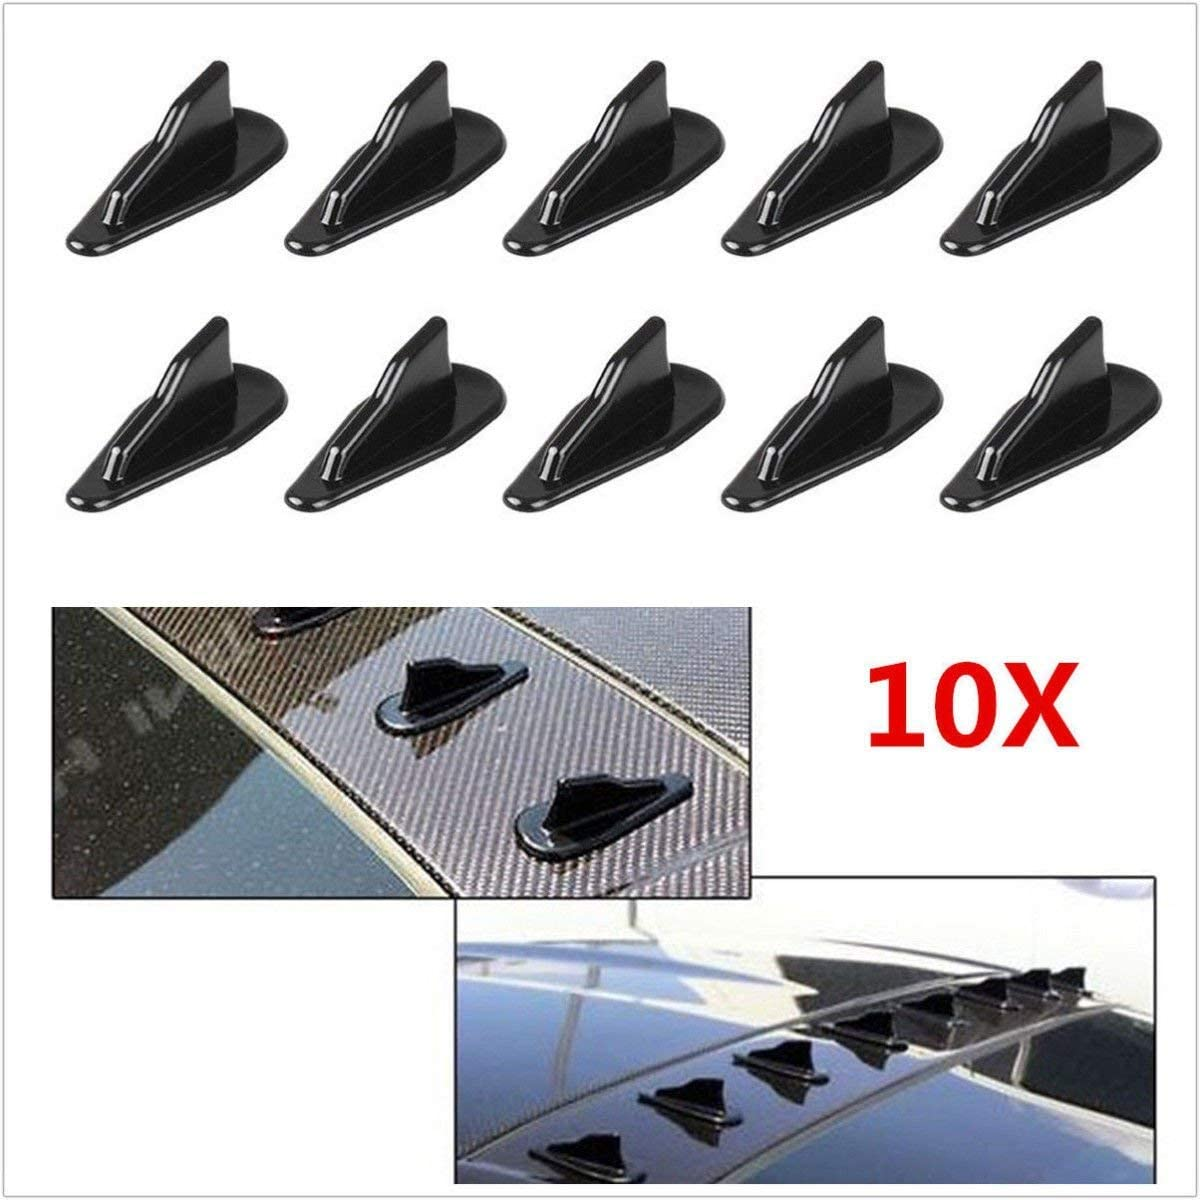 SUNWAN 10 Pcs Black Carbon Fiber Look Autos Off-Road Rear Roof Shark Fins Spoiler Wing Shark Fins Spoiler Wing